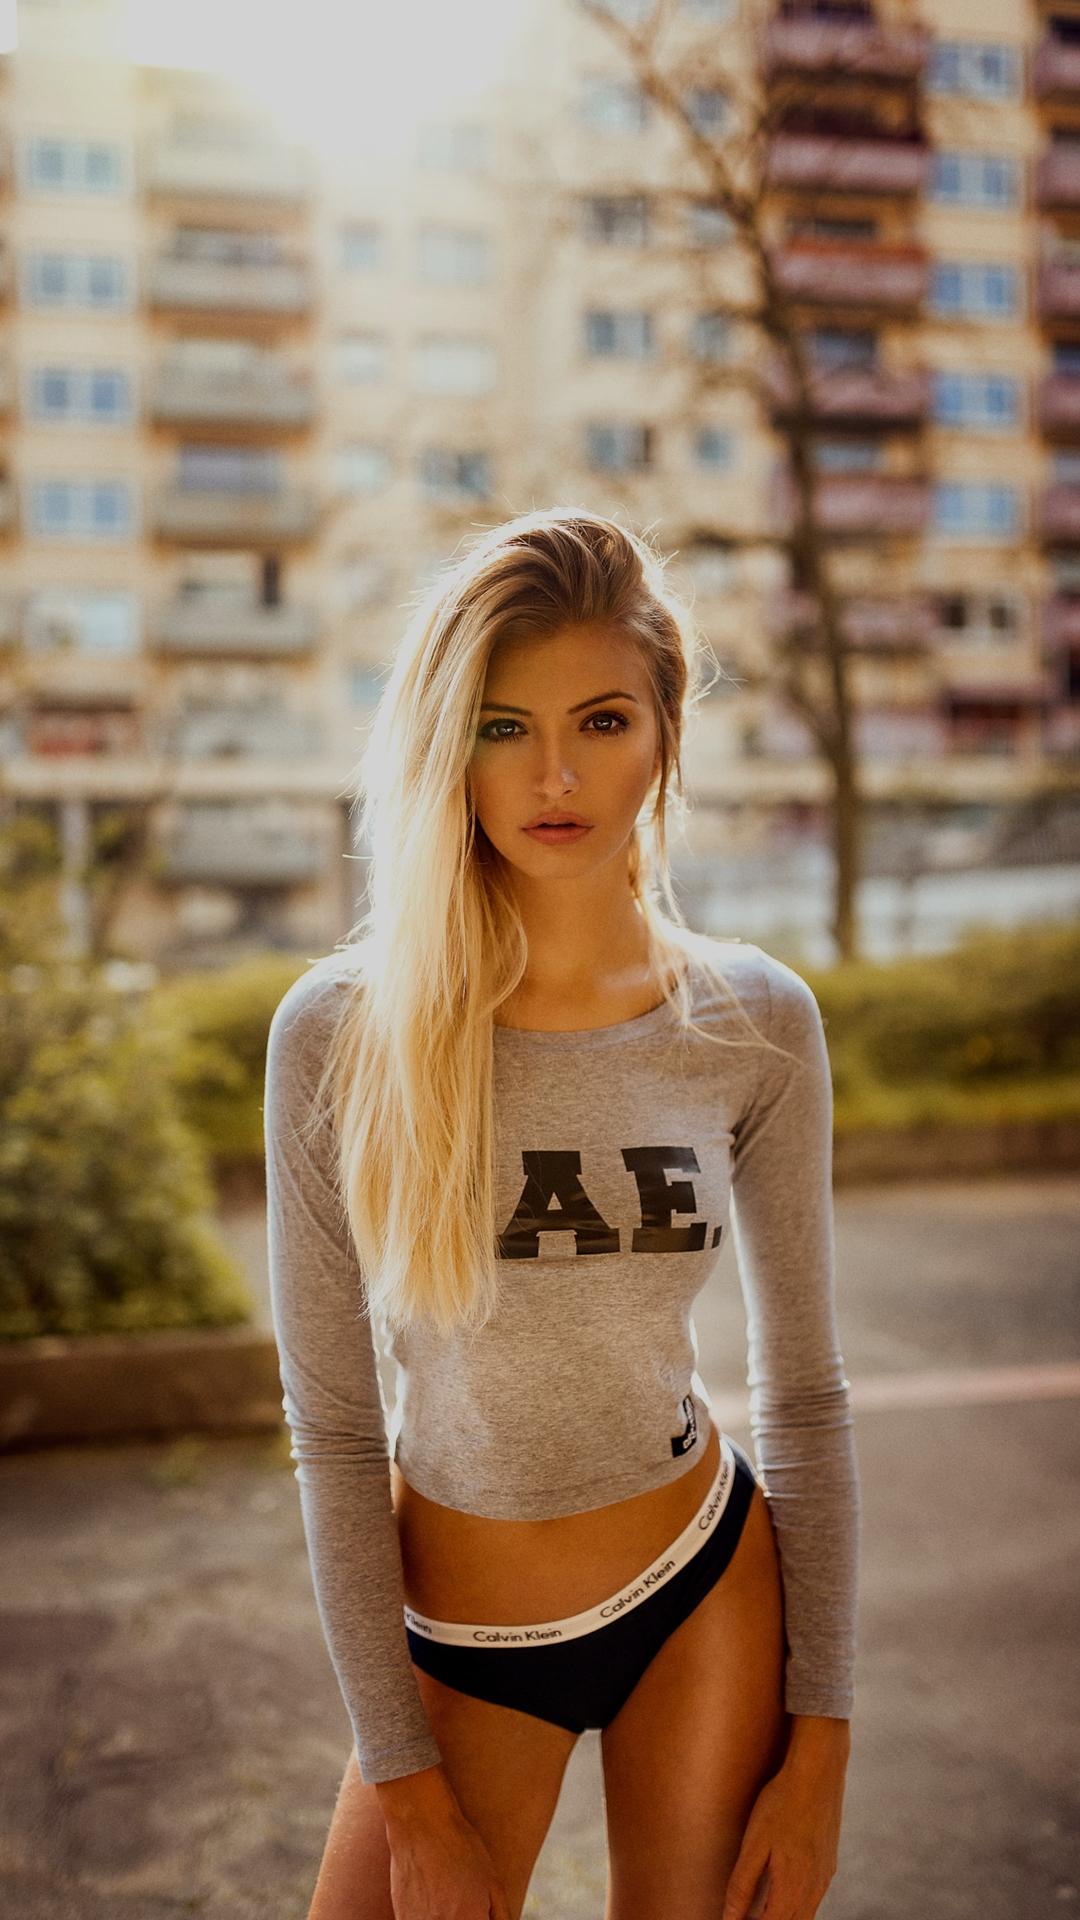 Beautiful blonde women wallpaper